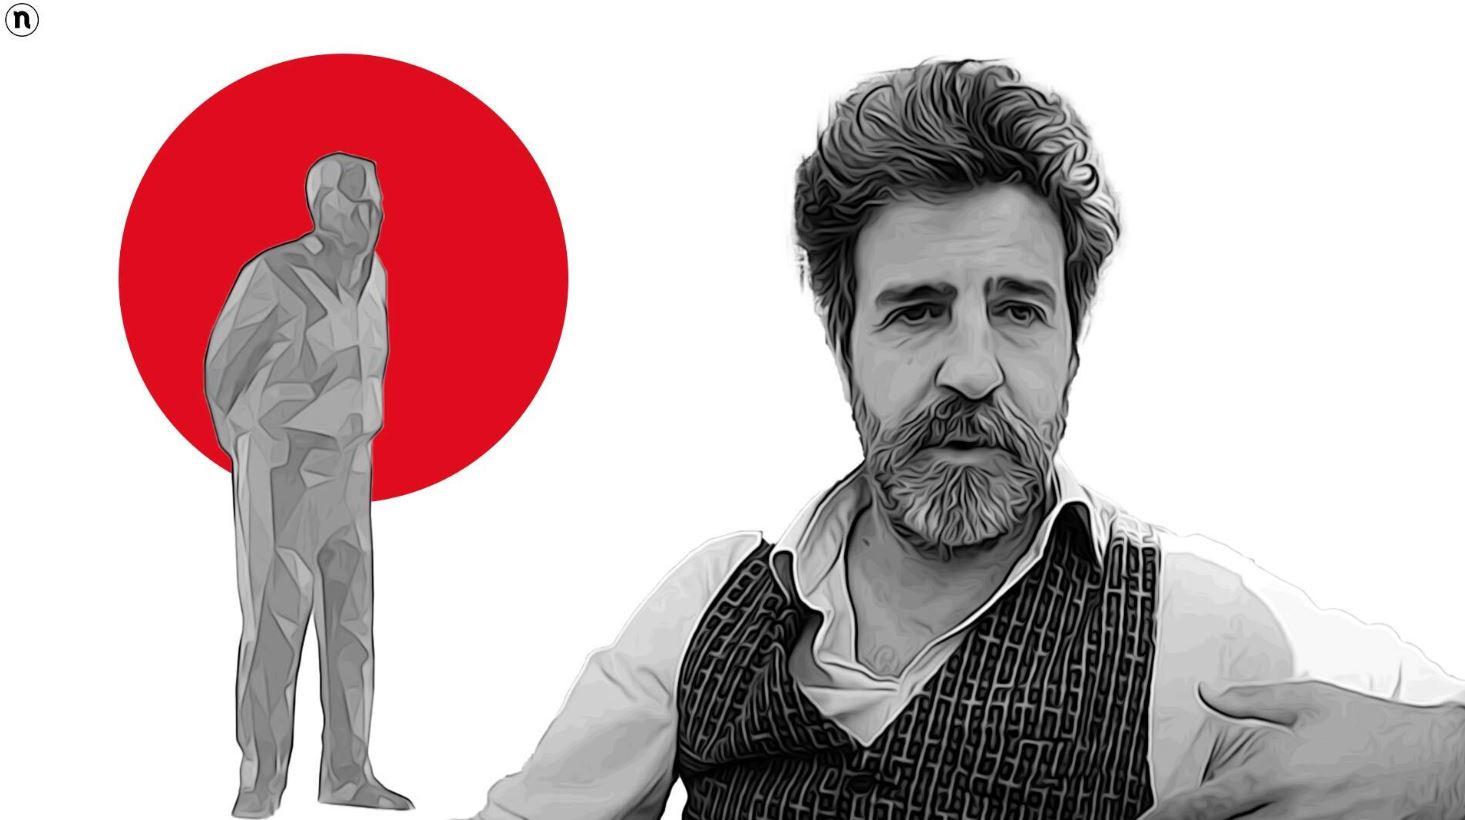 Podcast, Steve Jobs e stampa 3D: intervista a Massimo Temporelli